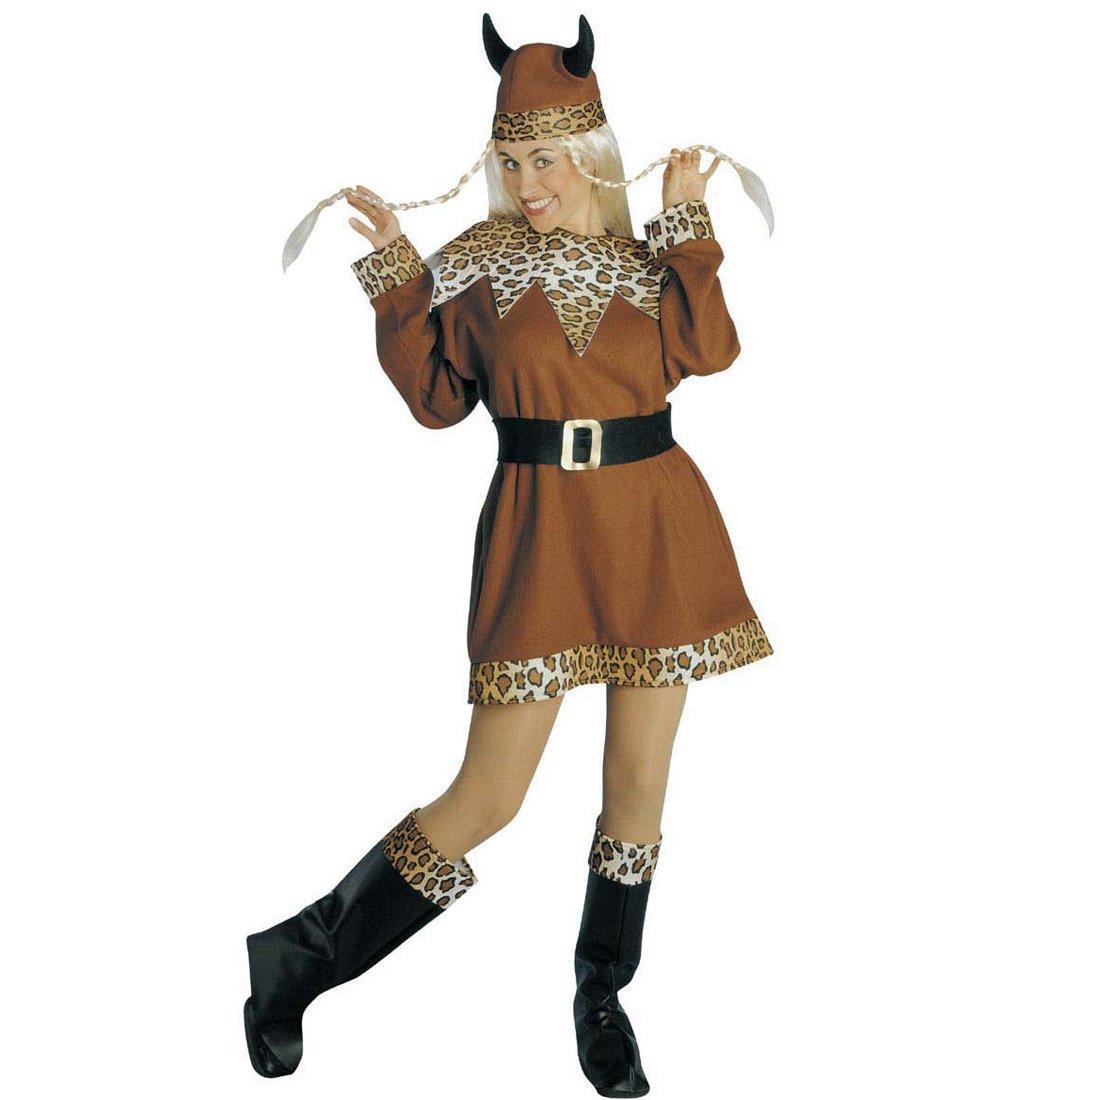 Vikingo Disfraz Mujer Vikingo Disfraz medieval barbarin para mujer Disfraz wikingerin heroína Medieval Disfraz Mar Ladrones Disfraz Bárbaro galos para ...